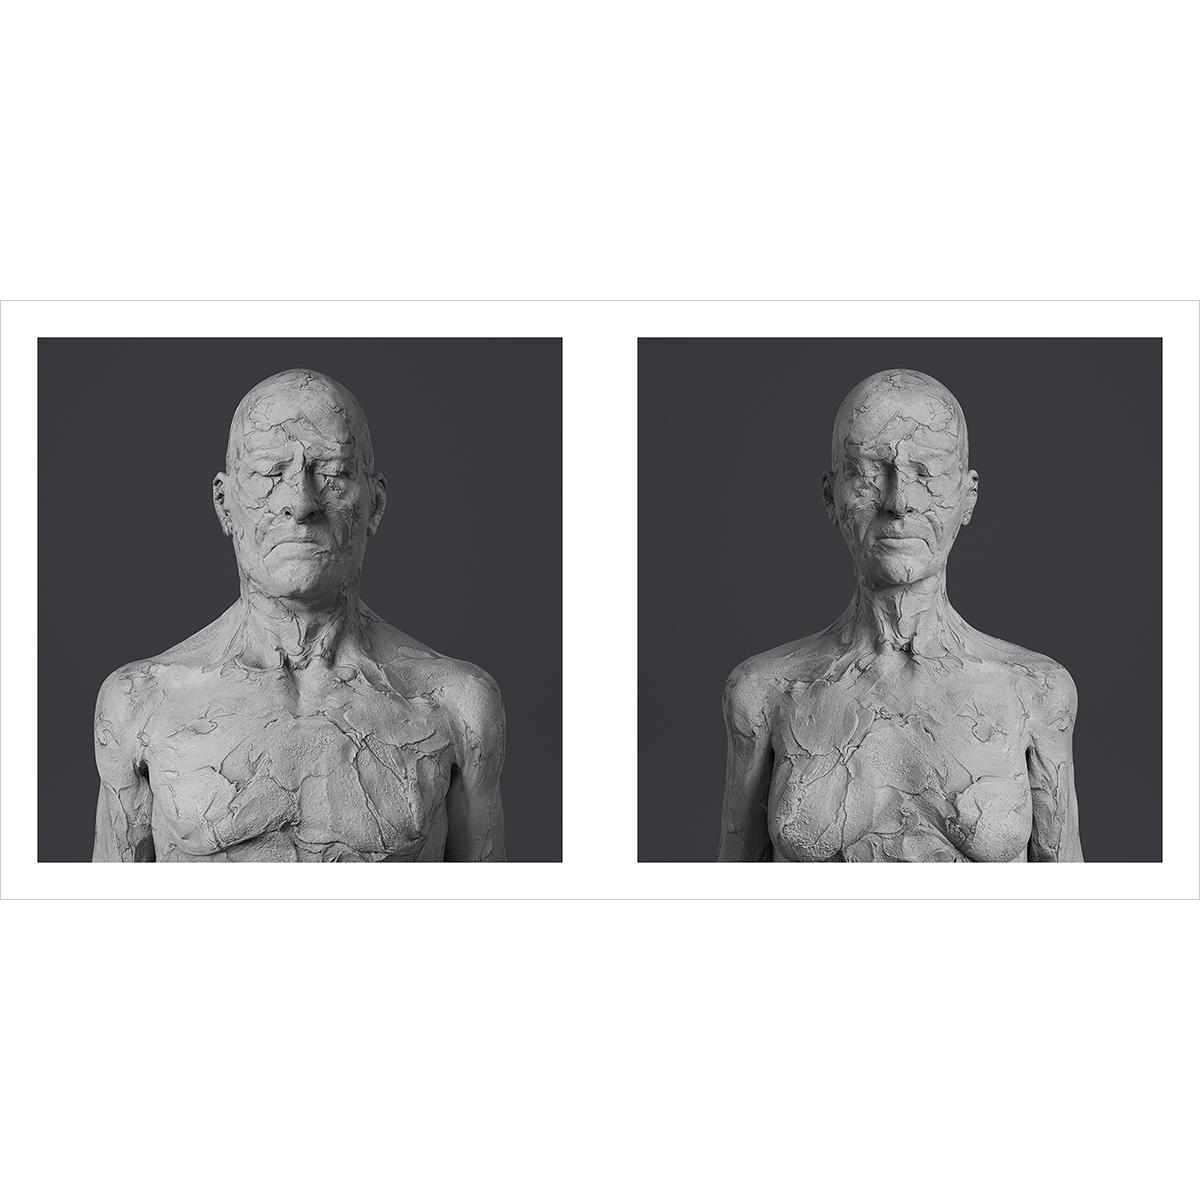 190 Virtual Portraits The couple RCC Busts 000 12001200 1 - 2021 - Virtual Portraits. (The couple - Realistic Chunky Clay Busts)